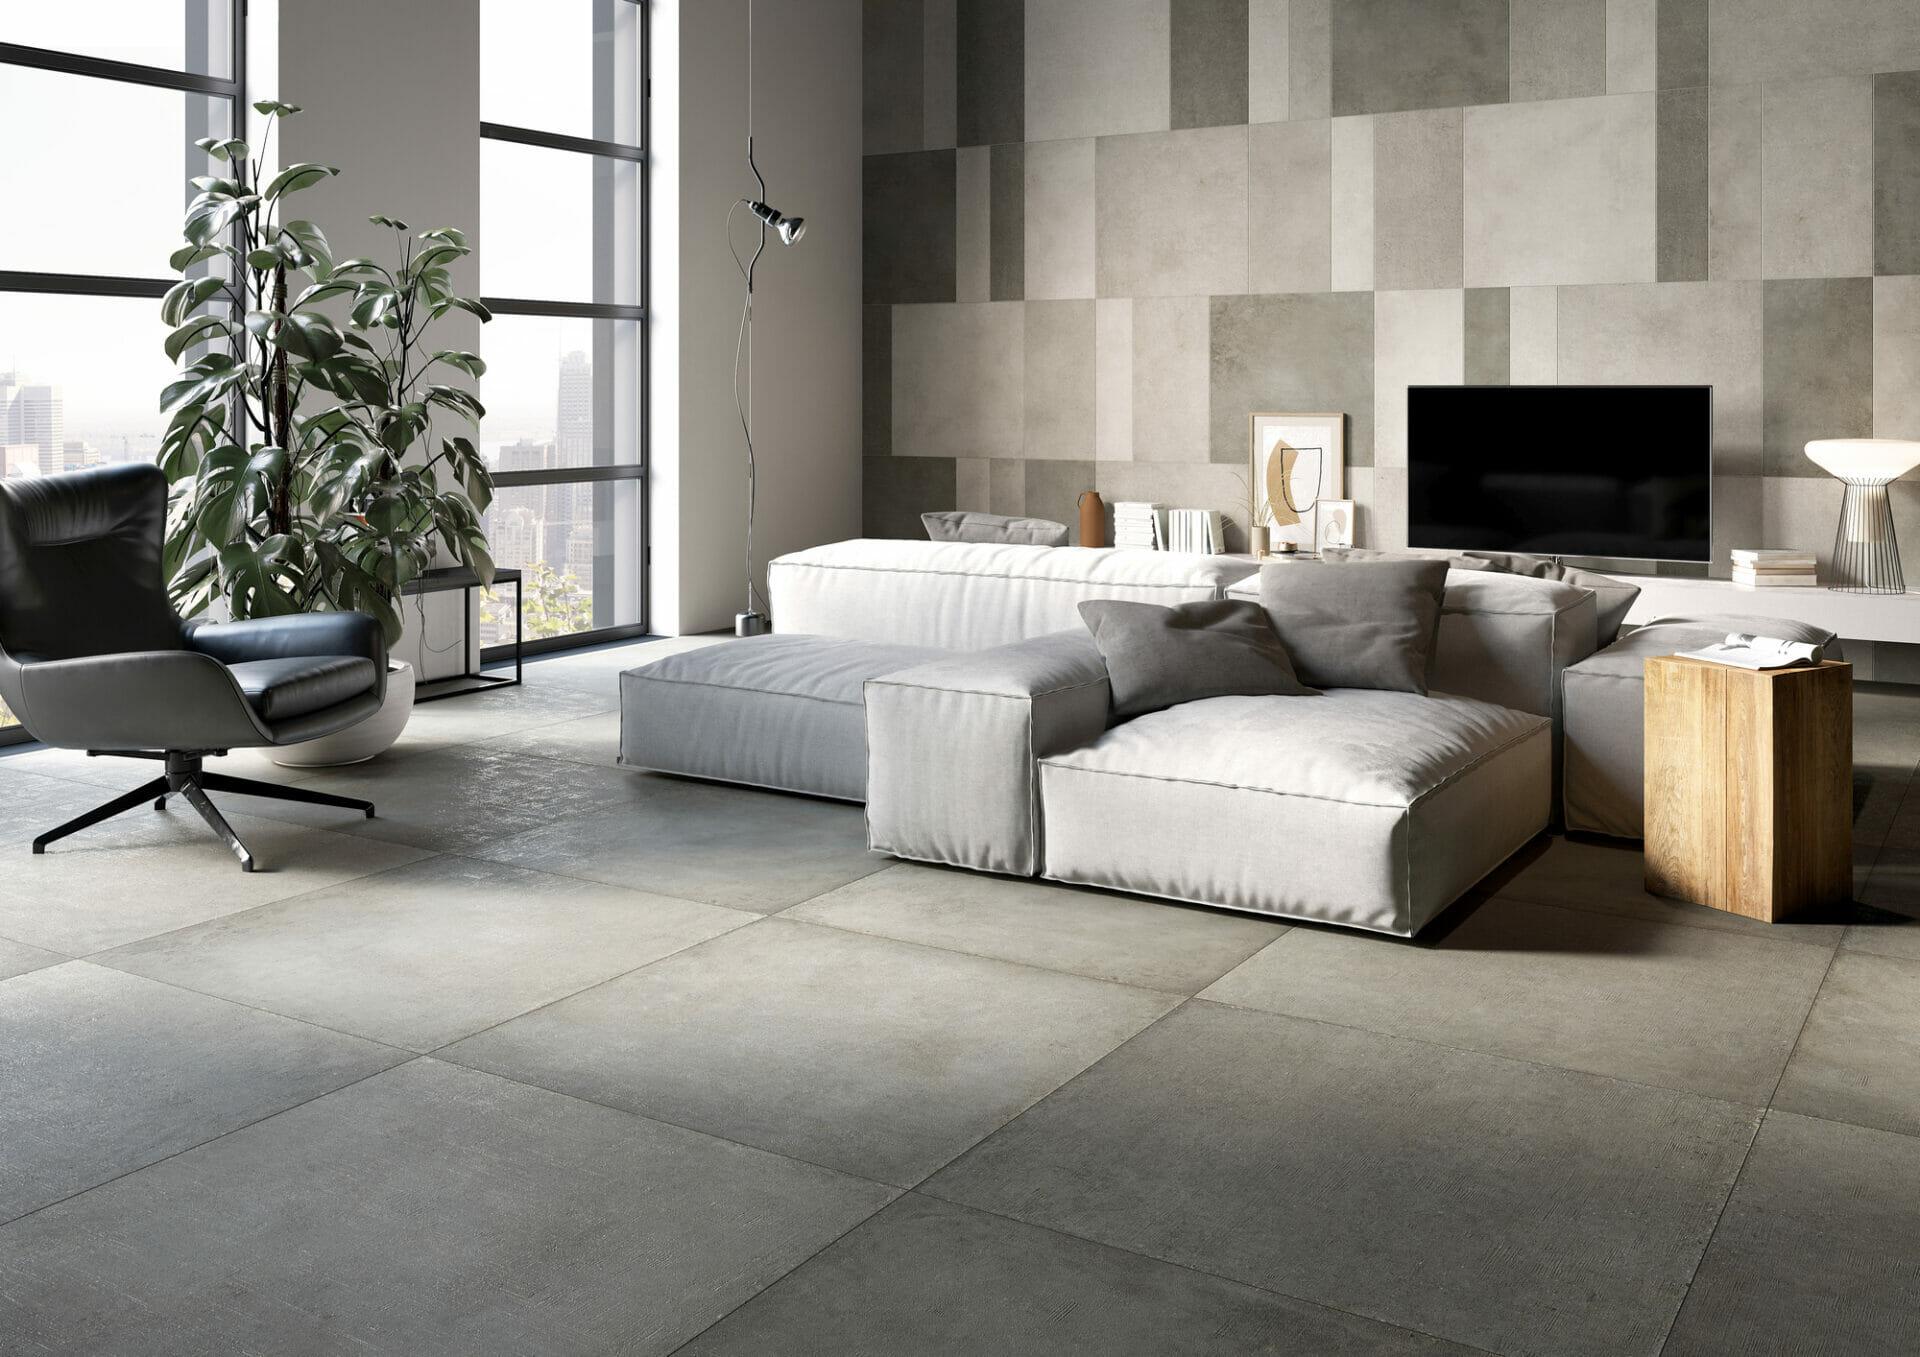 Industry Grey Room setting